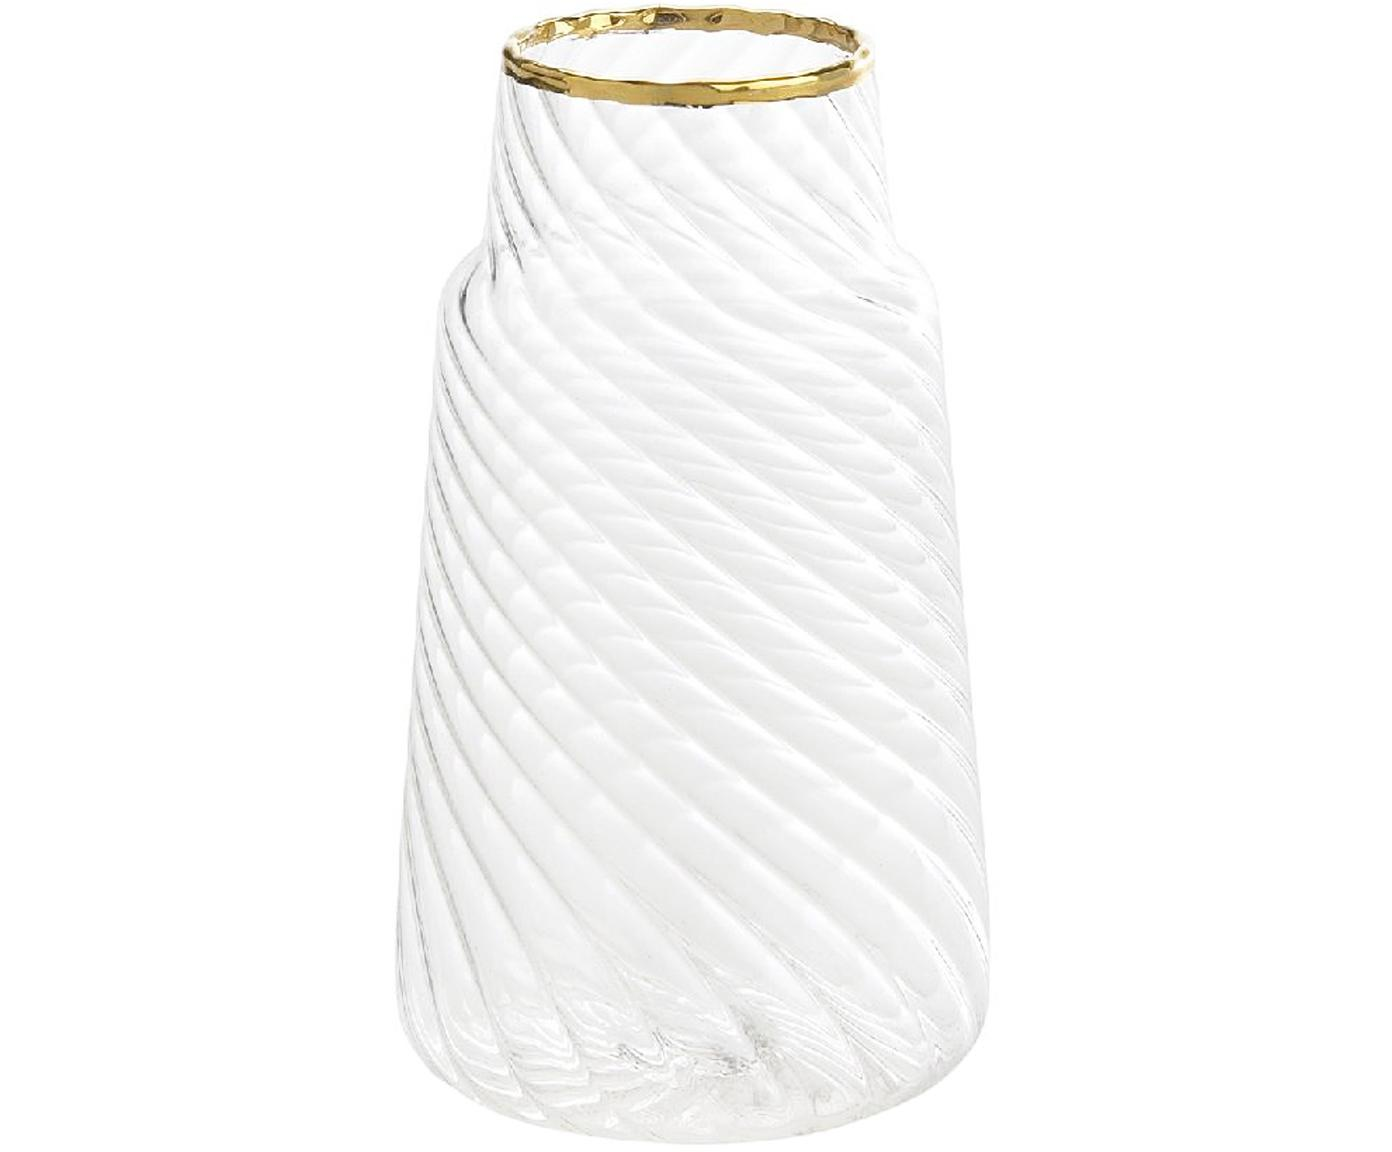 Kleine glazen vaas Plunn, Glas, Transparant, goudkleurig, Ø 6 x H 11 cm